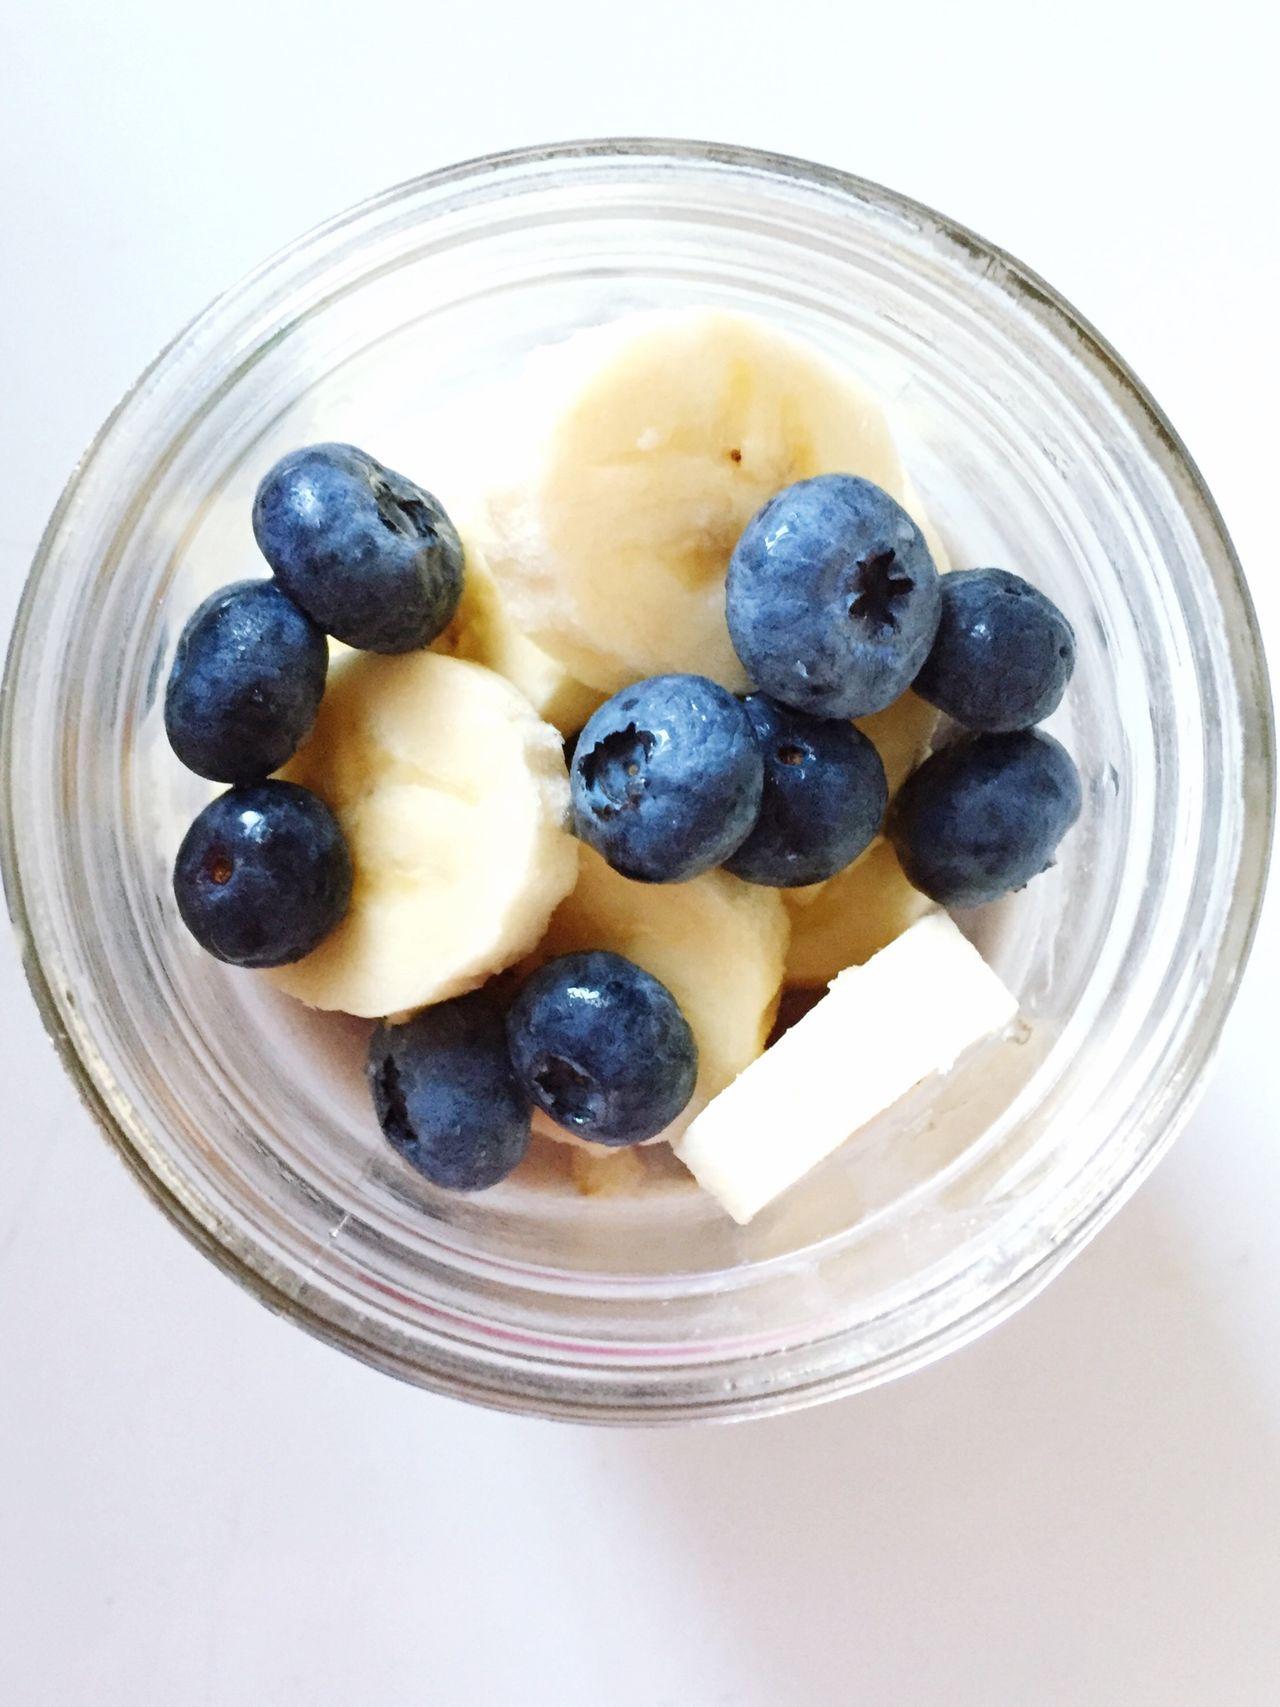 Beautiful stock photos of banana, Banana, Berry Fruit, Blueberries, Blueberry